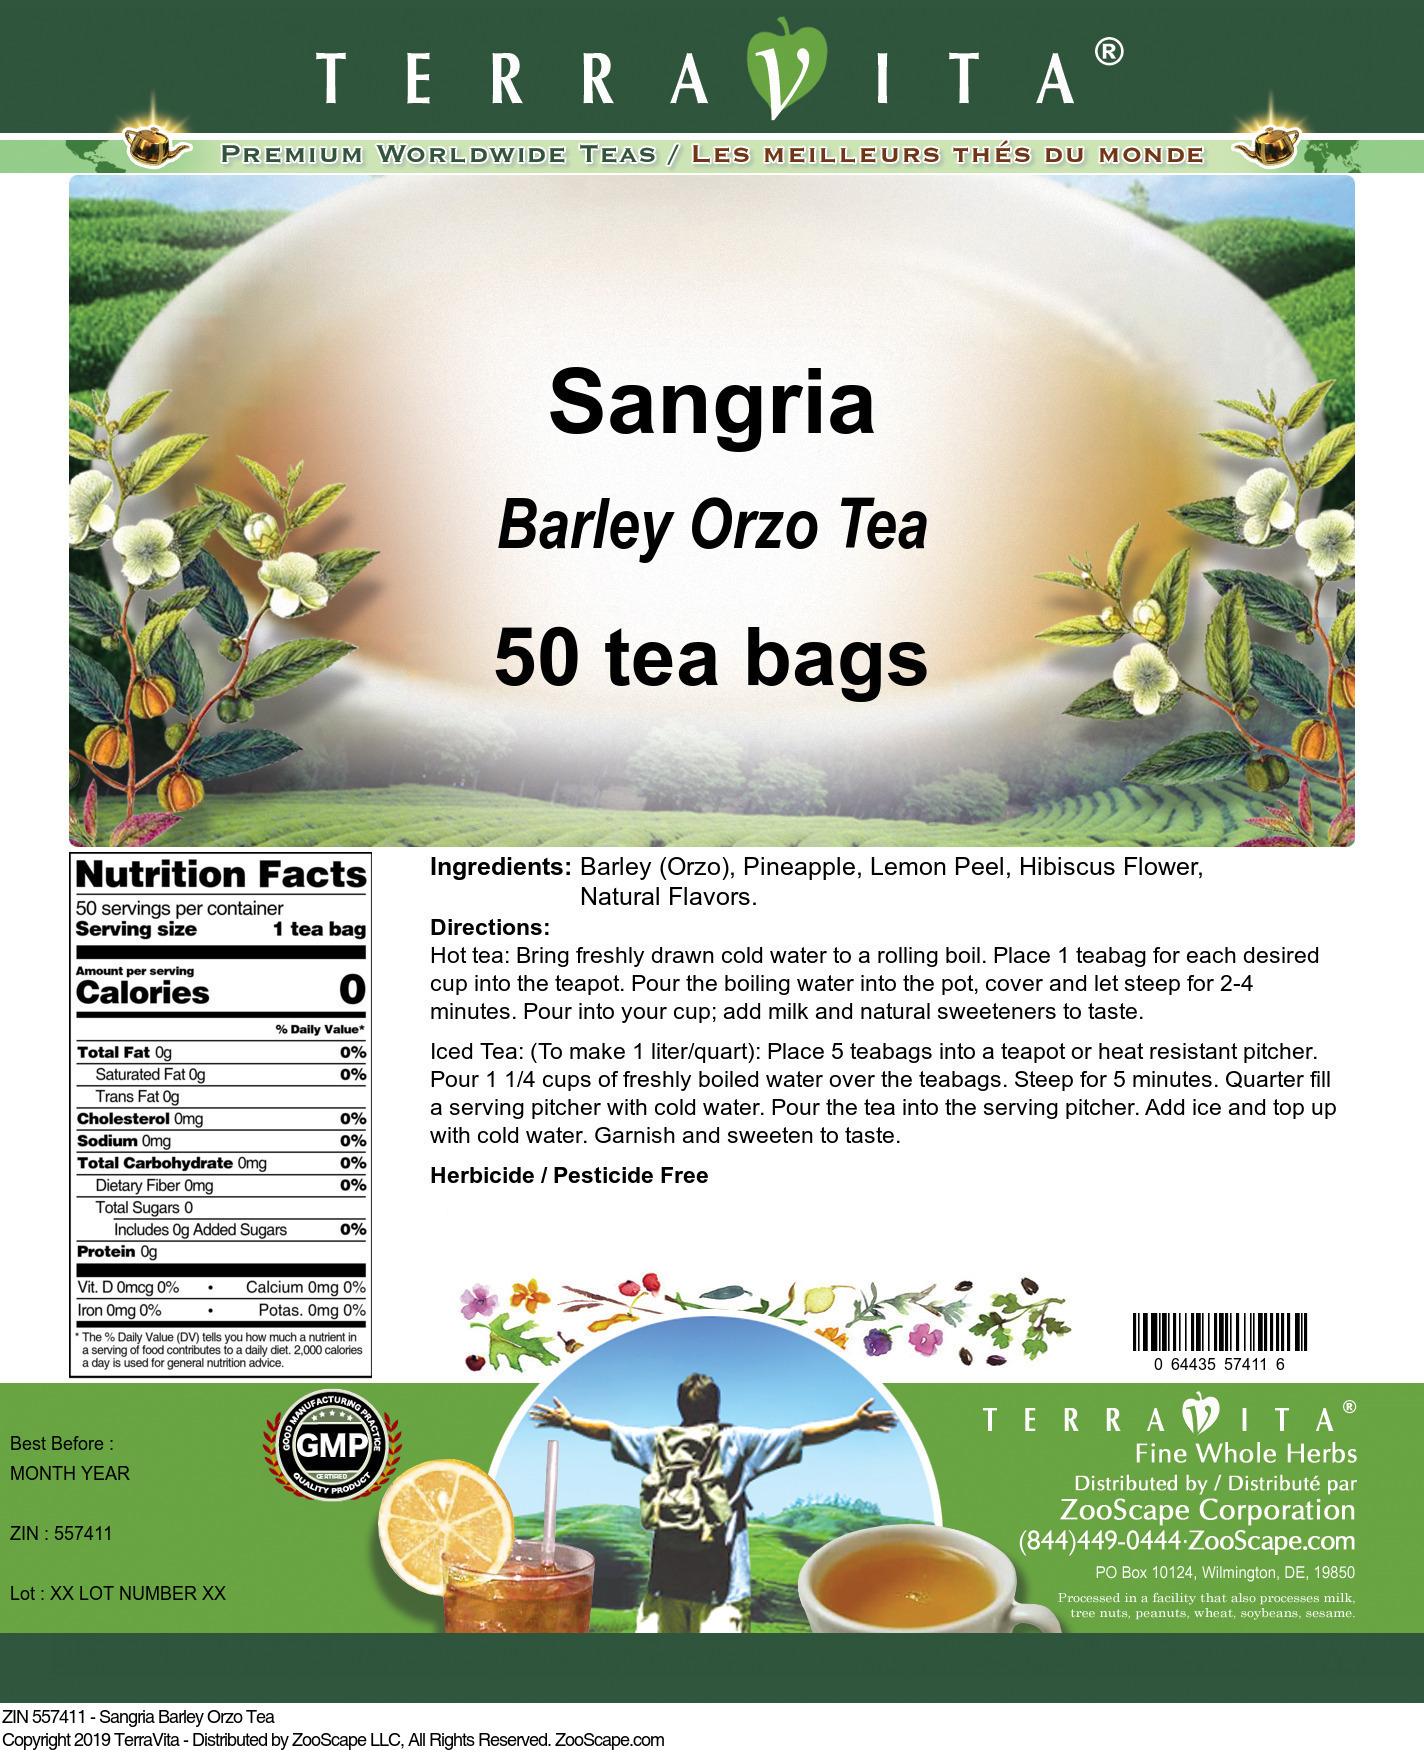 Sangria Barley Orzo Tea